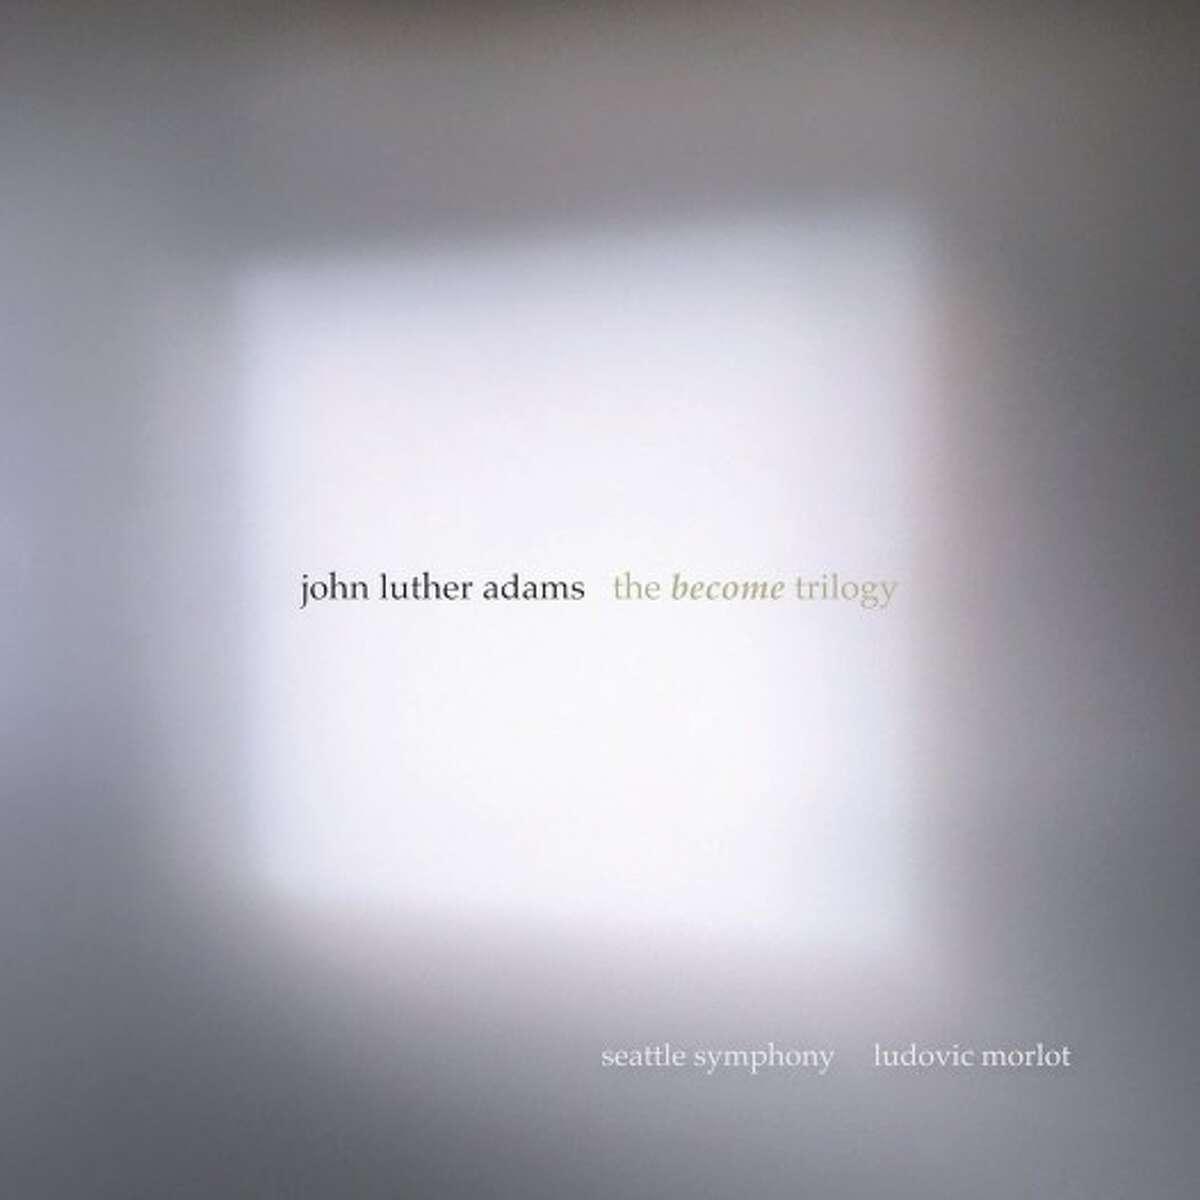 John Luther Adams